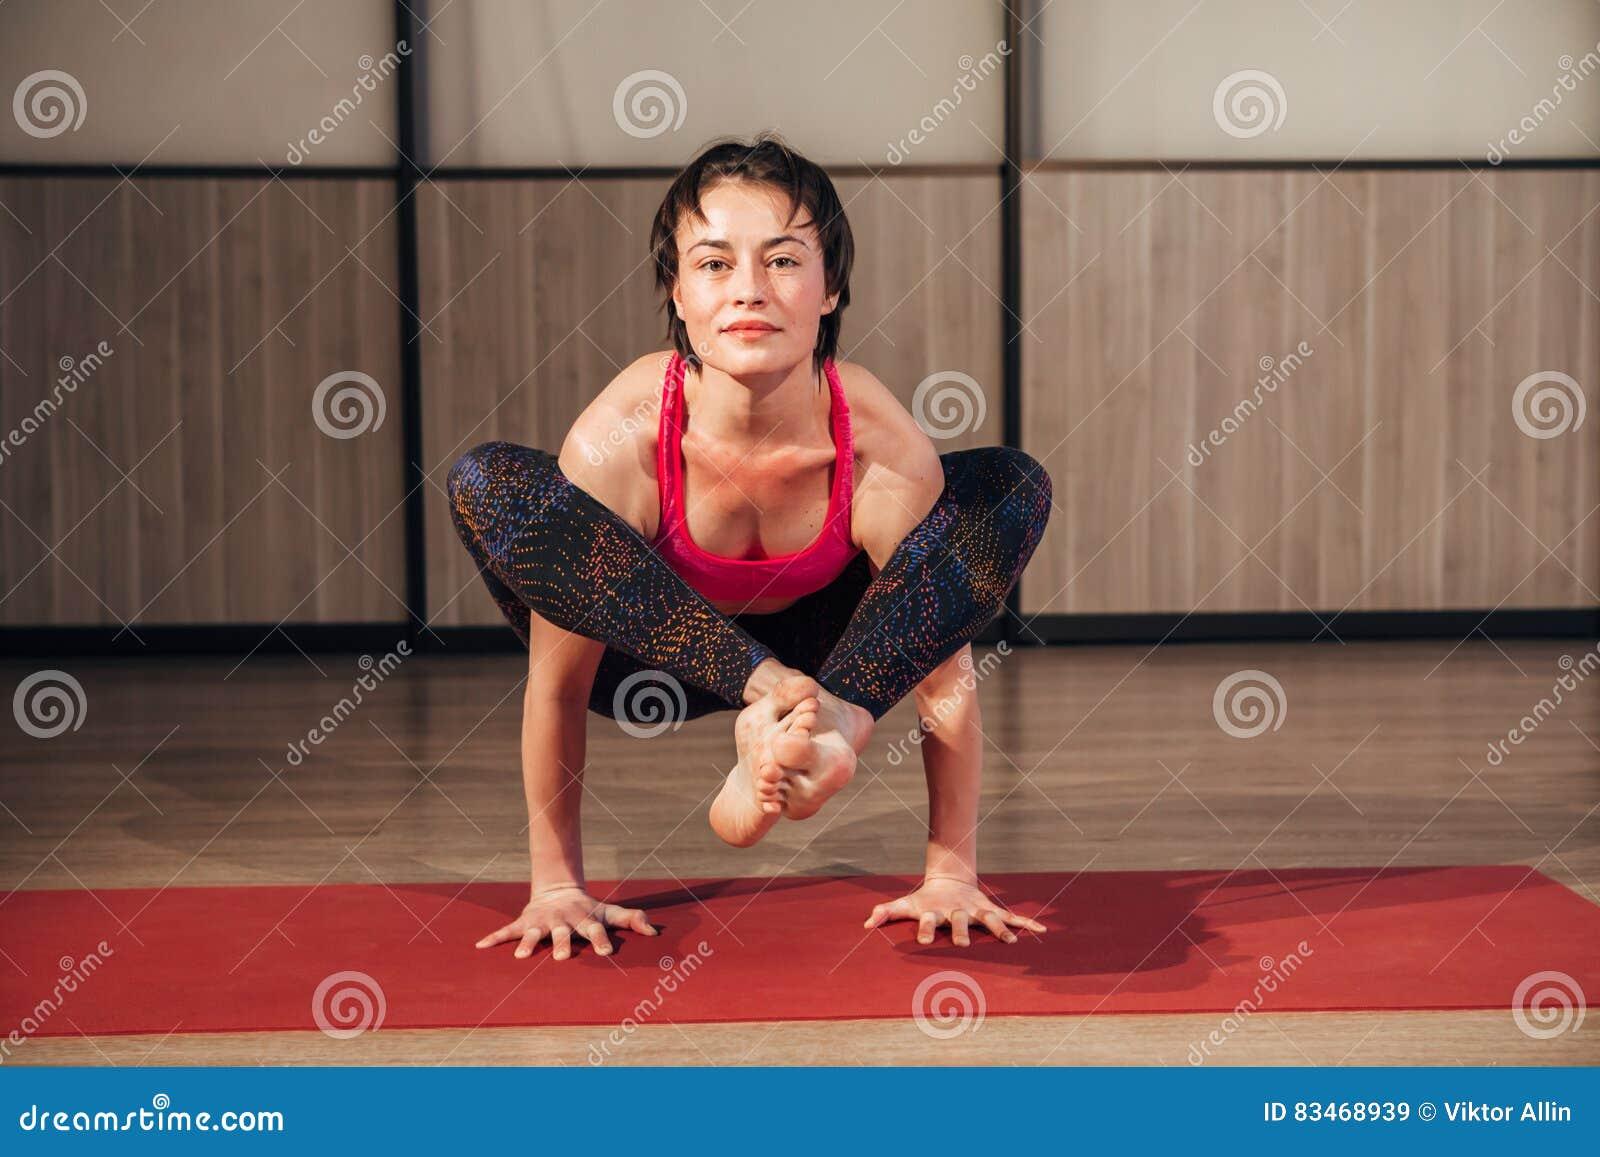 Female practicing yoga in a studio setting